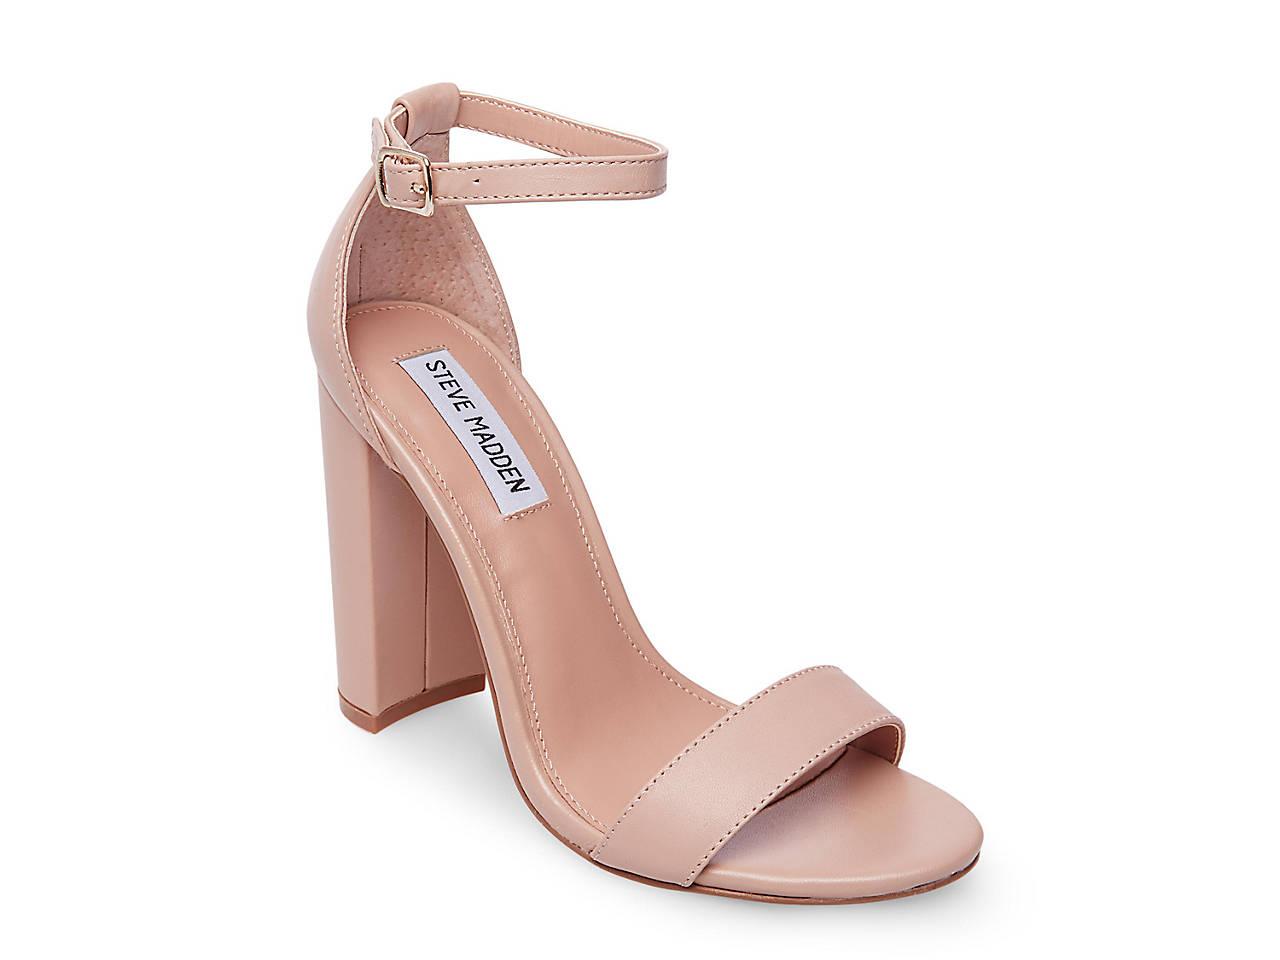 1ad4042da1b Steve Madden Carrson Sandal Women s Shoes